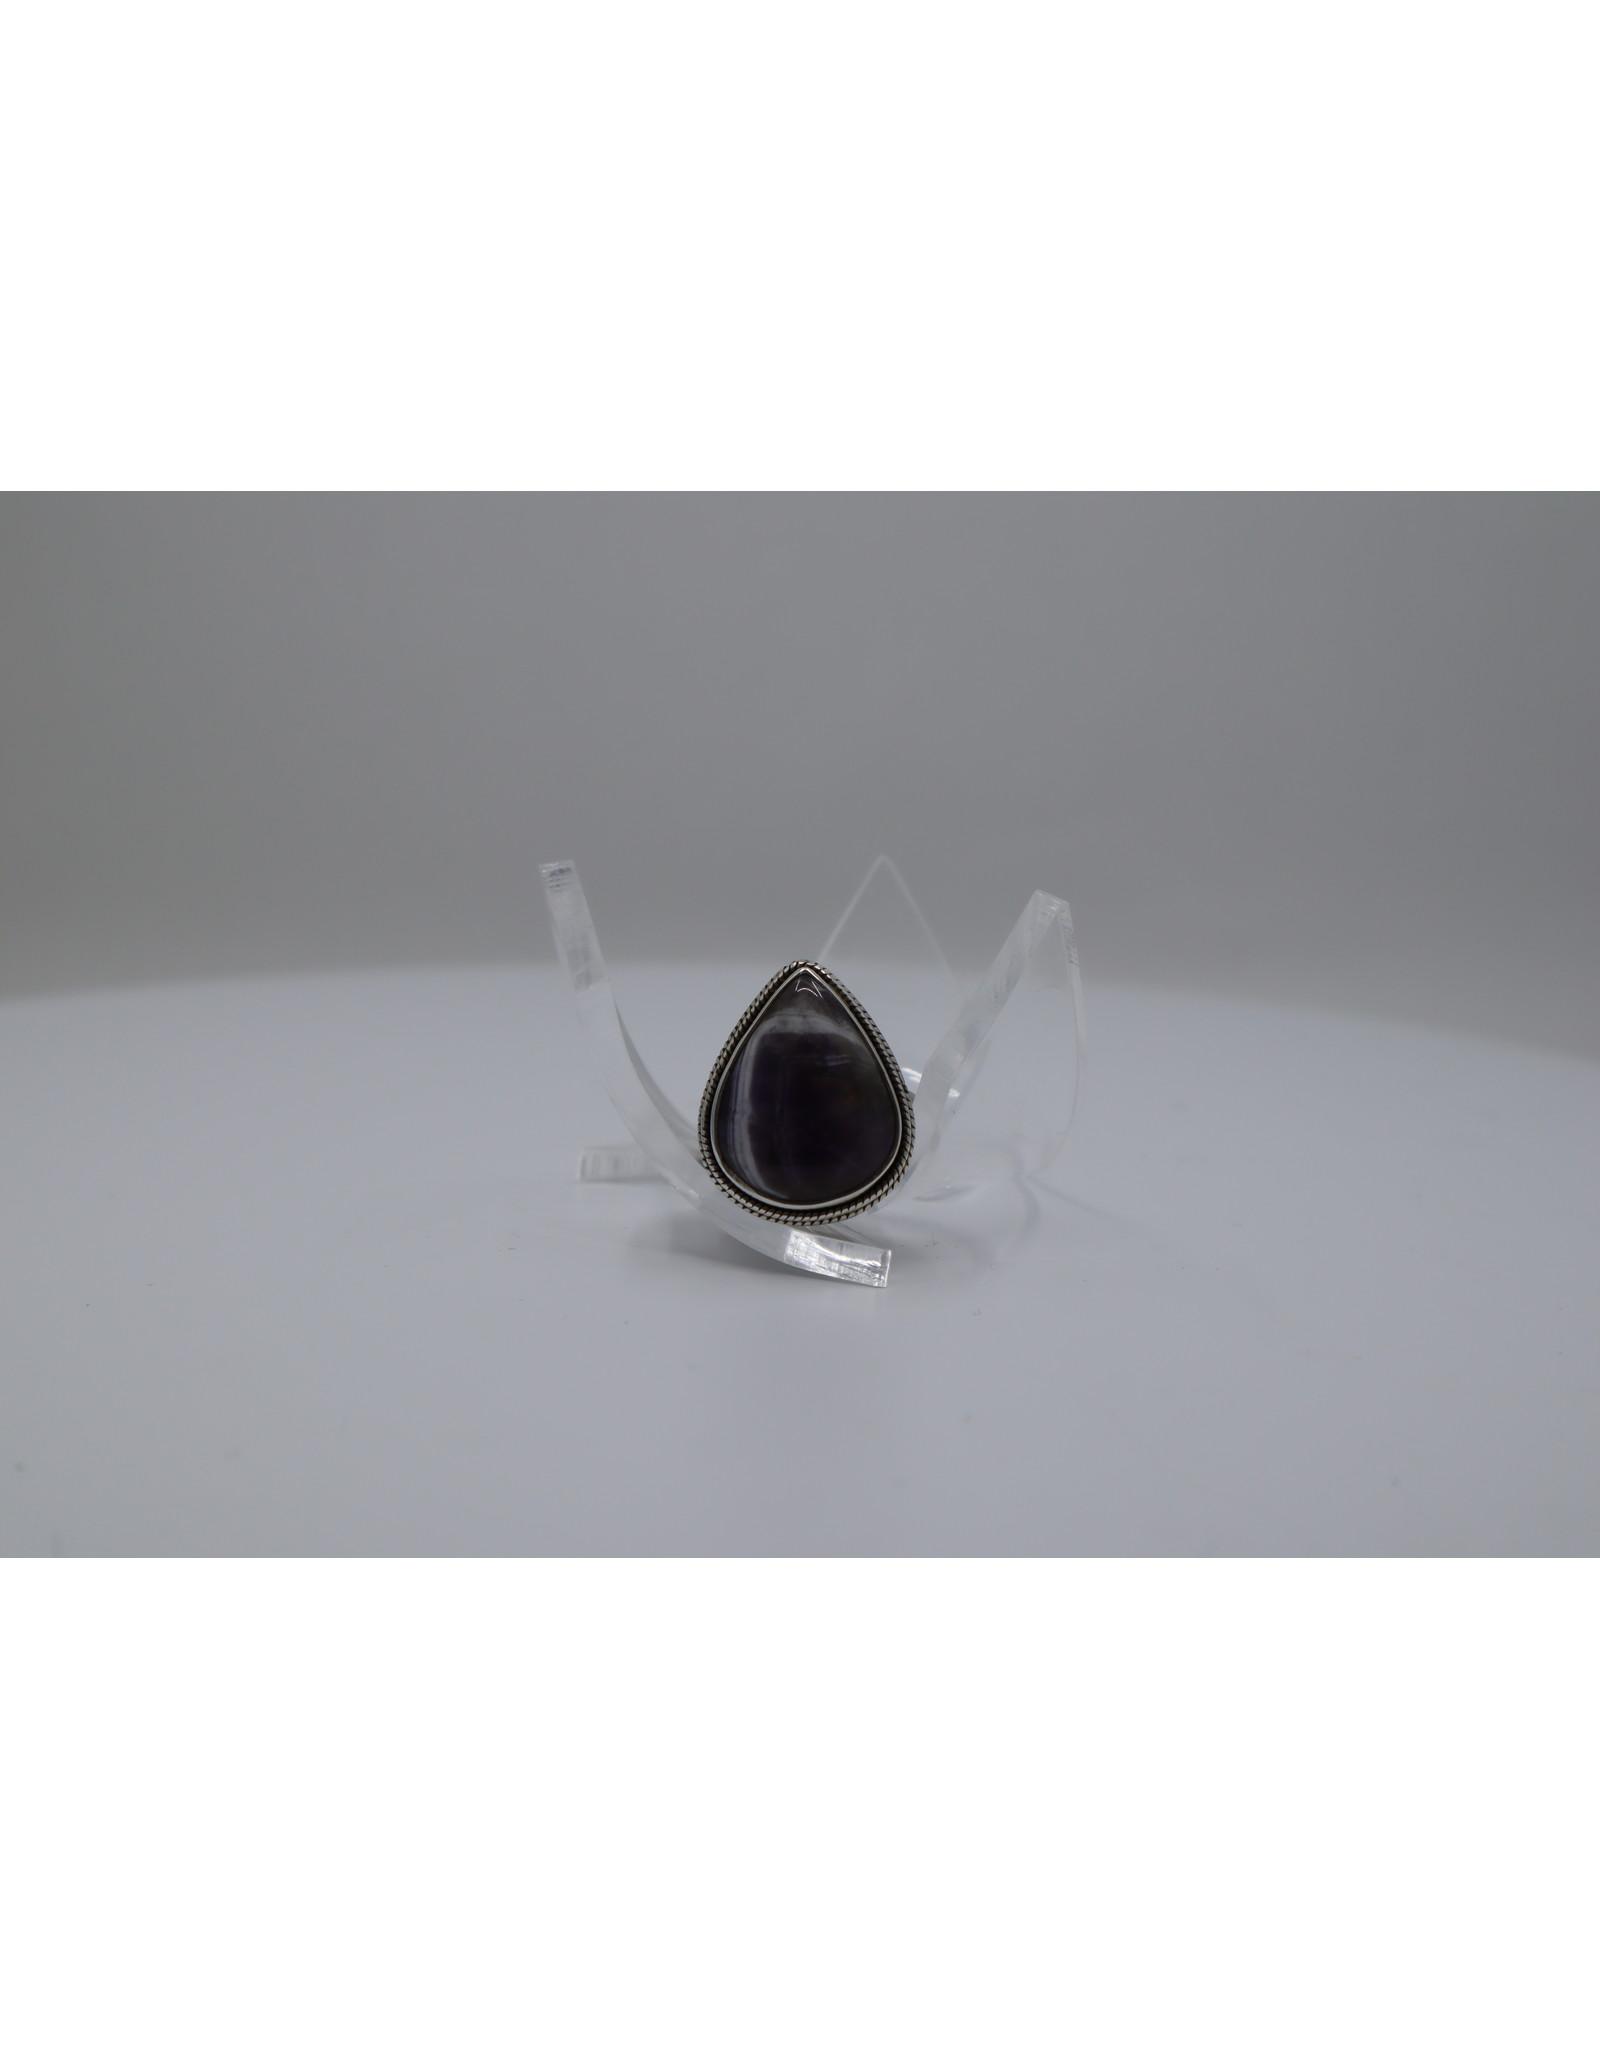 Chevron Amethyst Ring - Size 5.5